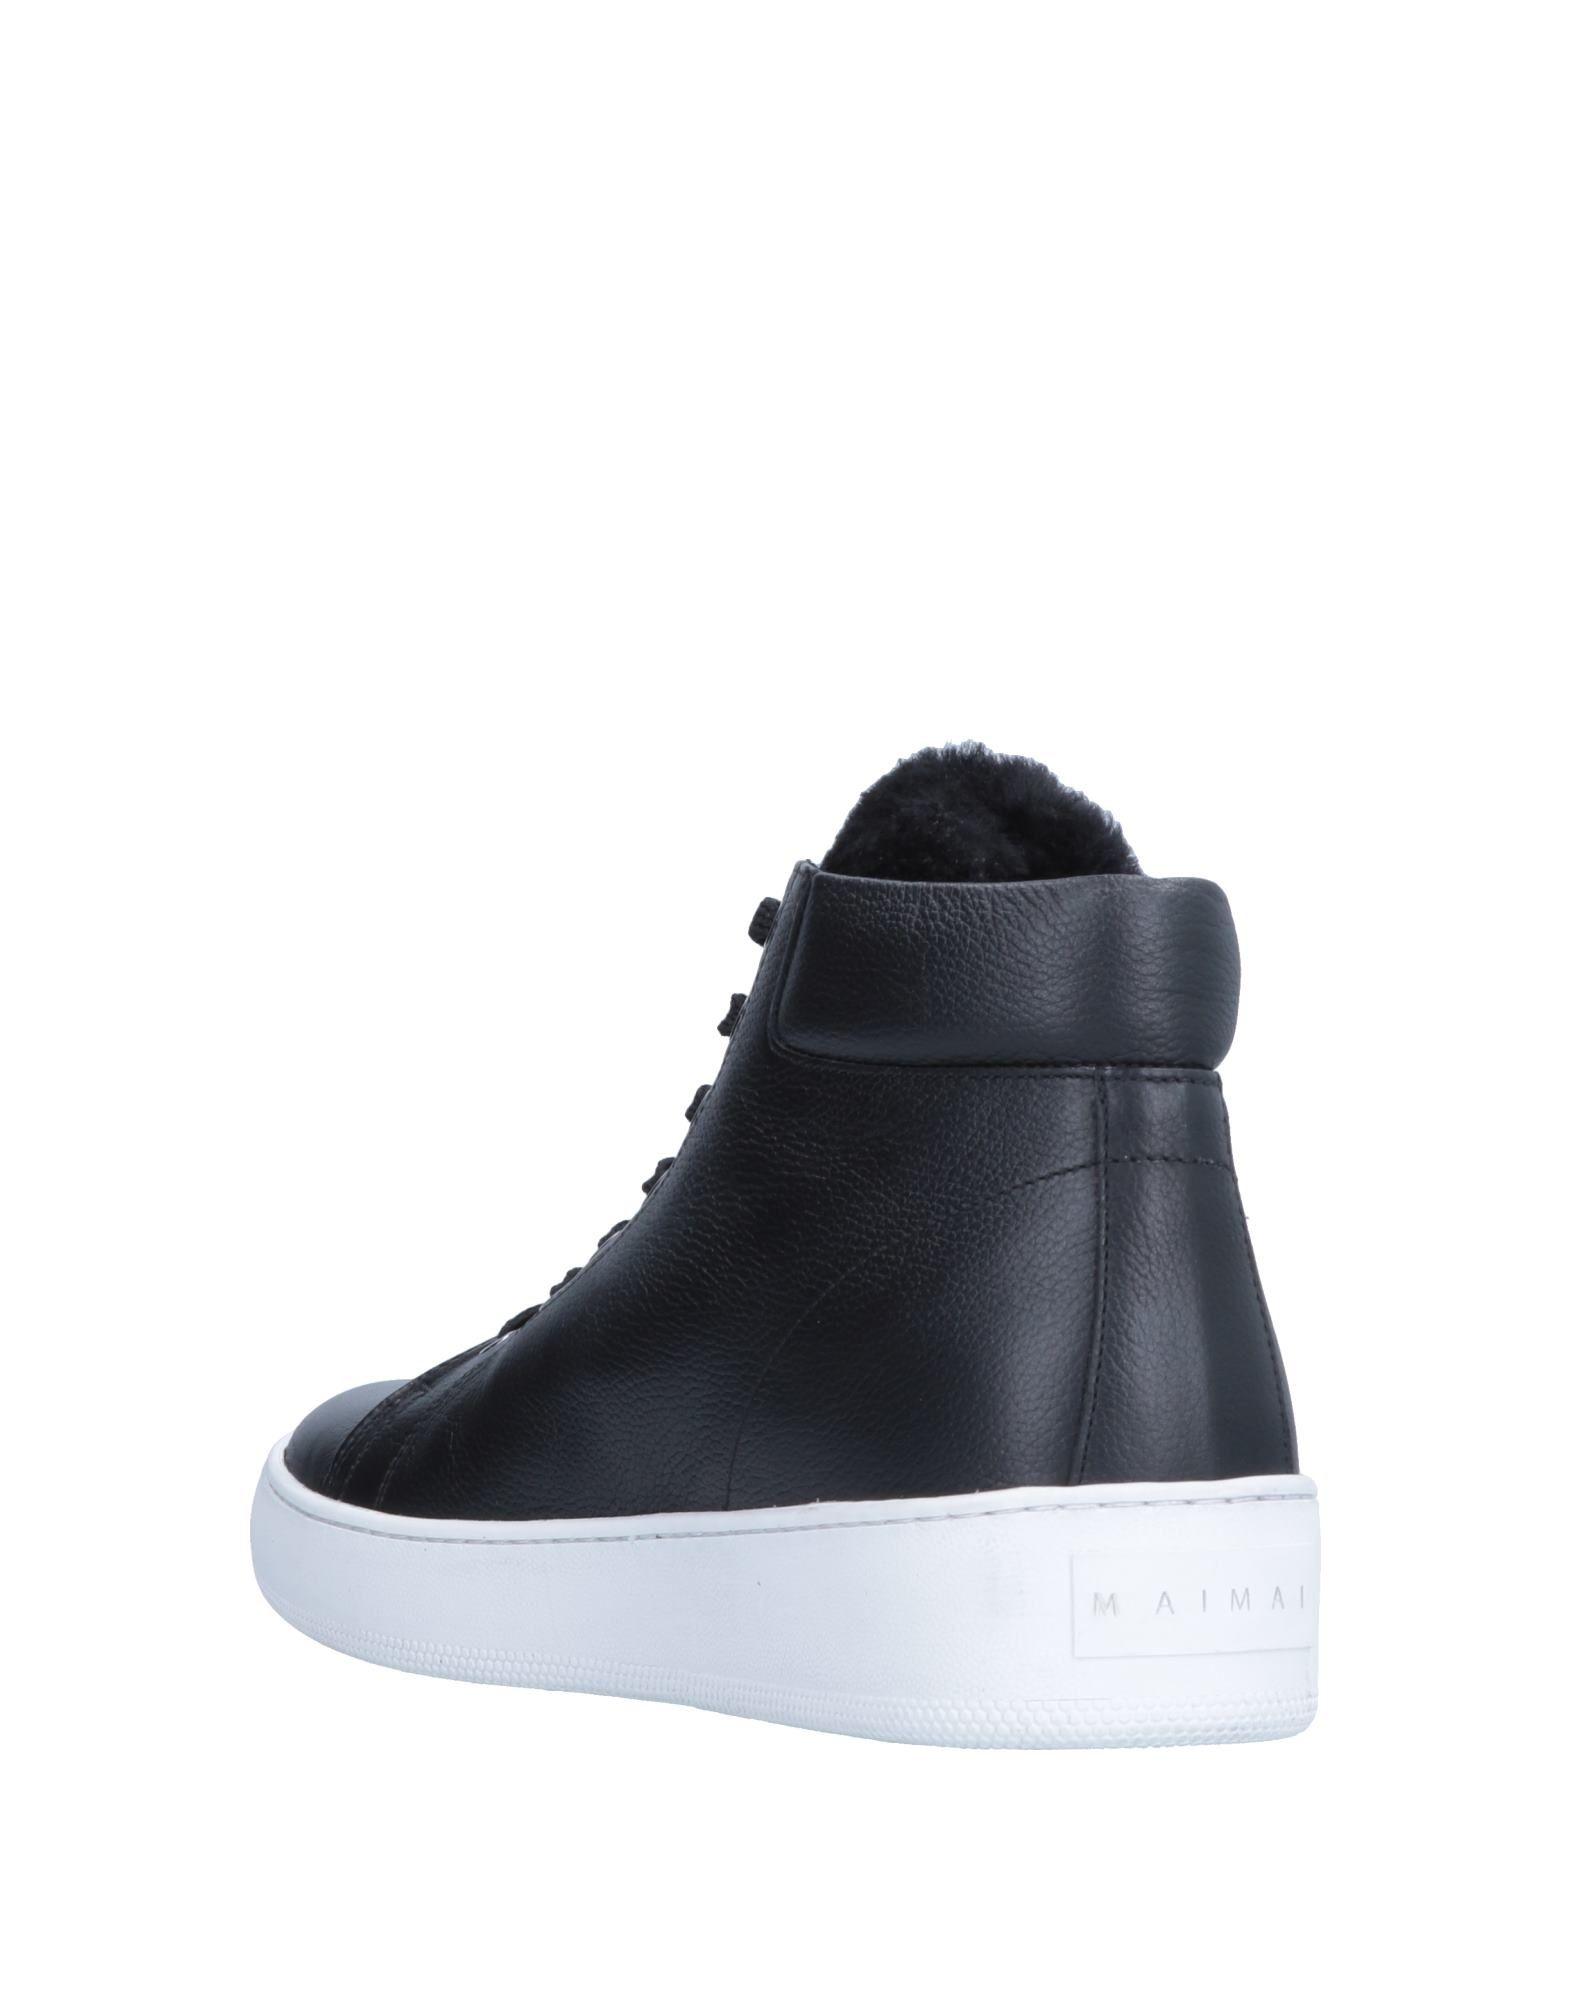 Gut um billige Schuhe  zu tragenMaimai Sneakers Damen  Schuhe 11546211TH 2347c8